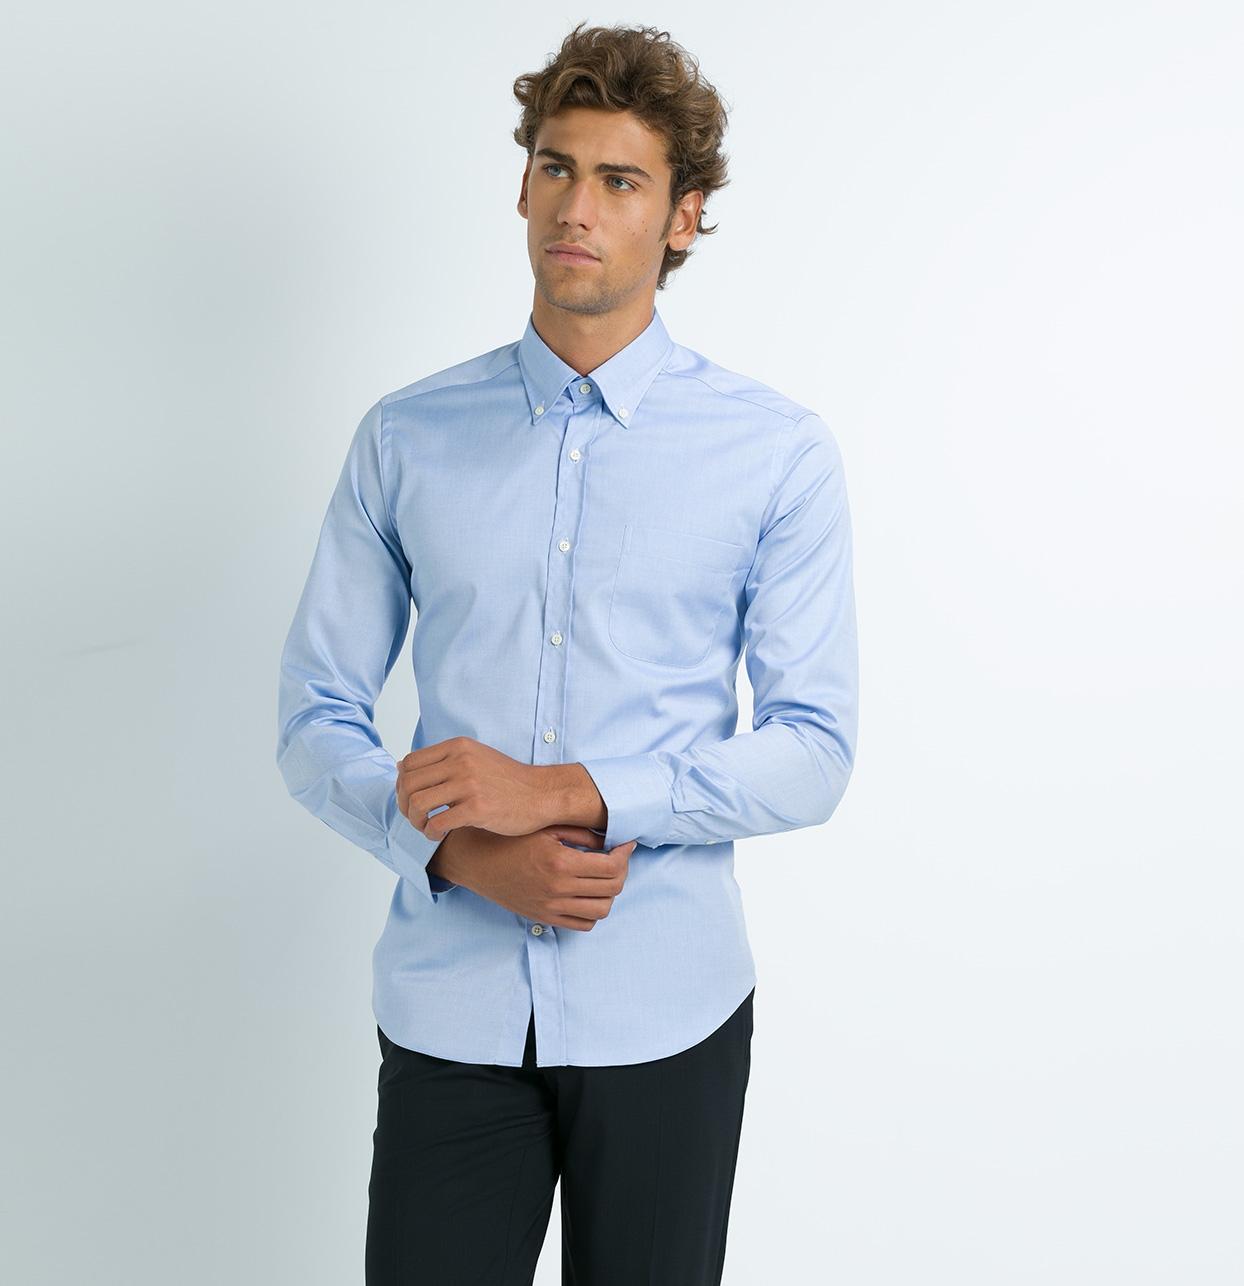 Camisa Formal Wear REGULAR FIT Modelo BOTTON DOWN Tejido Pin point color blanco, 100% Algodón - Ítem3